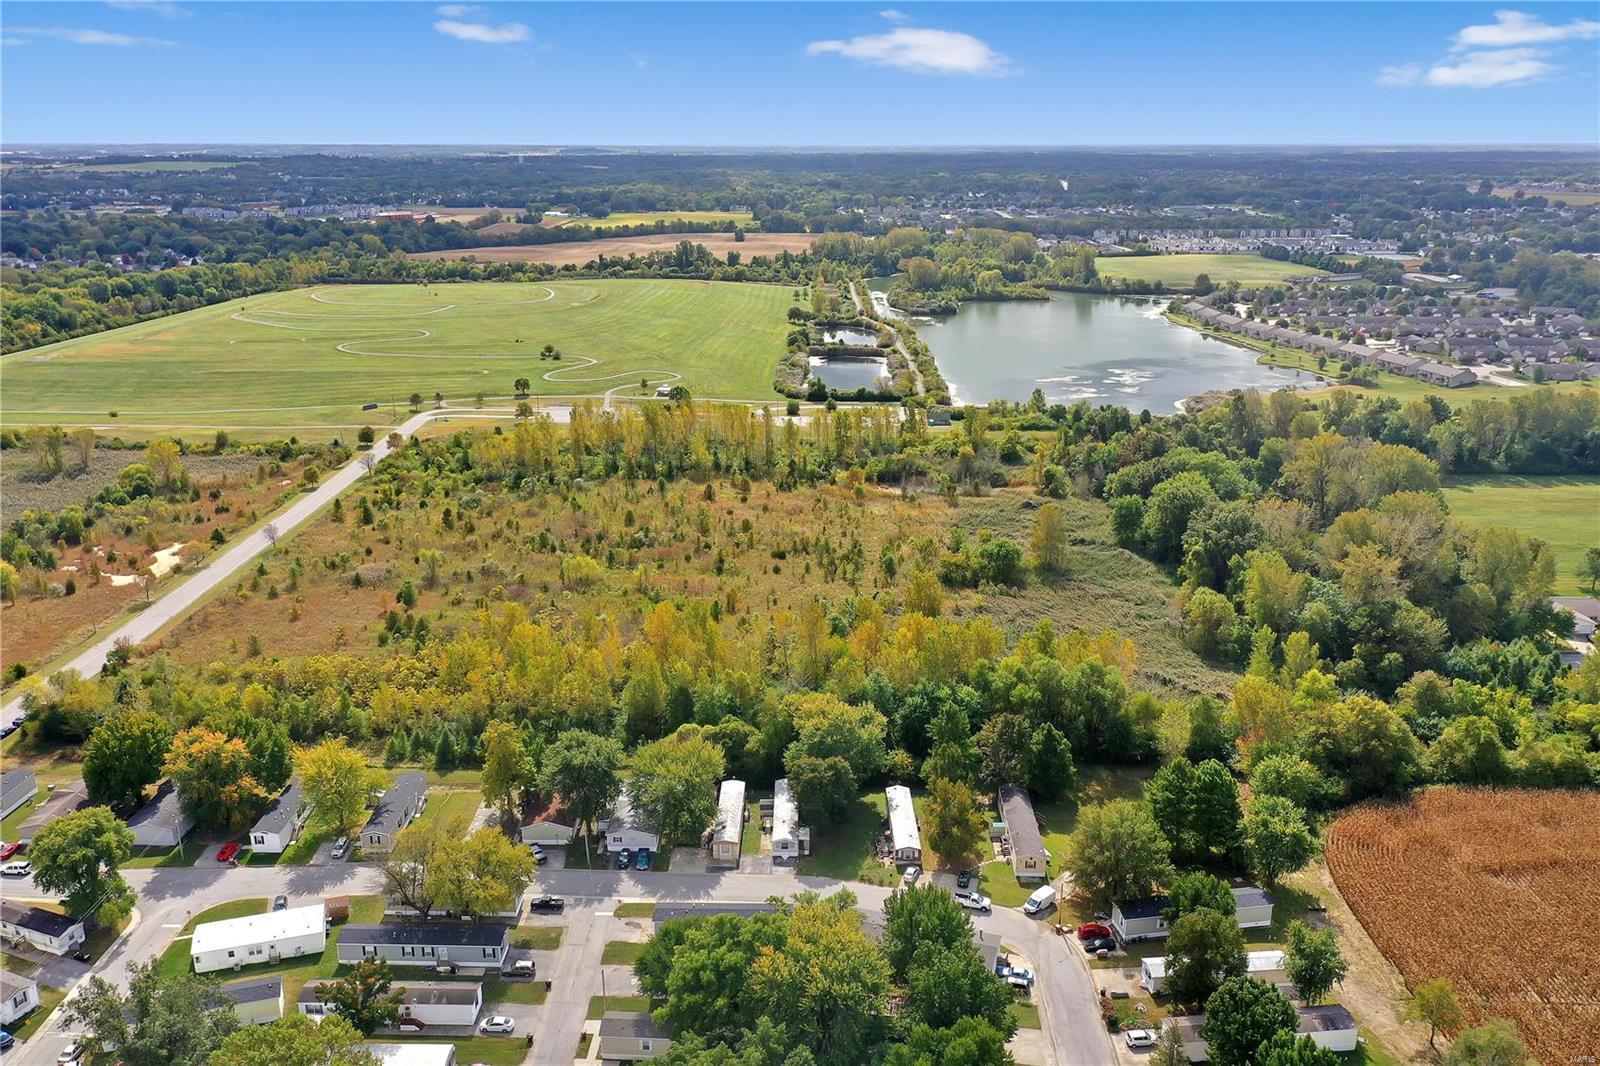 1619 W Highway 50 Property Photo - O'Fallon, IL real estate listing